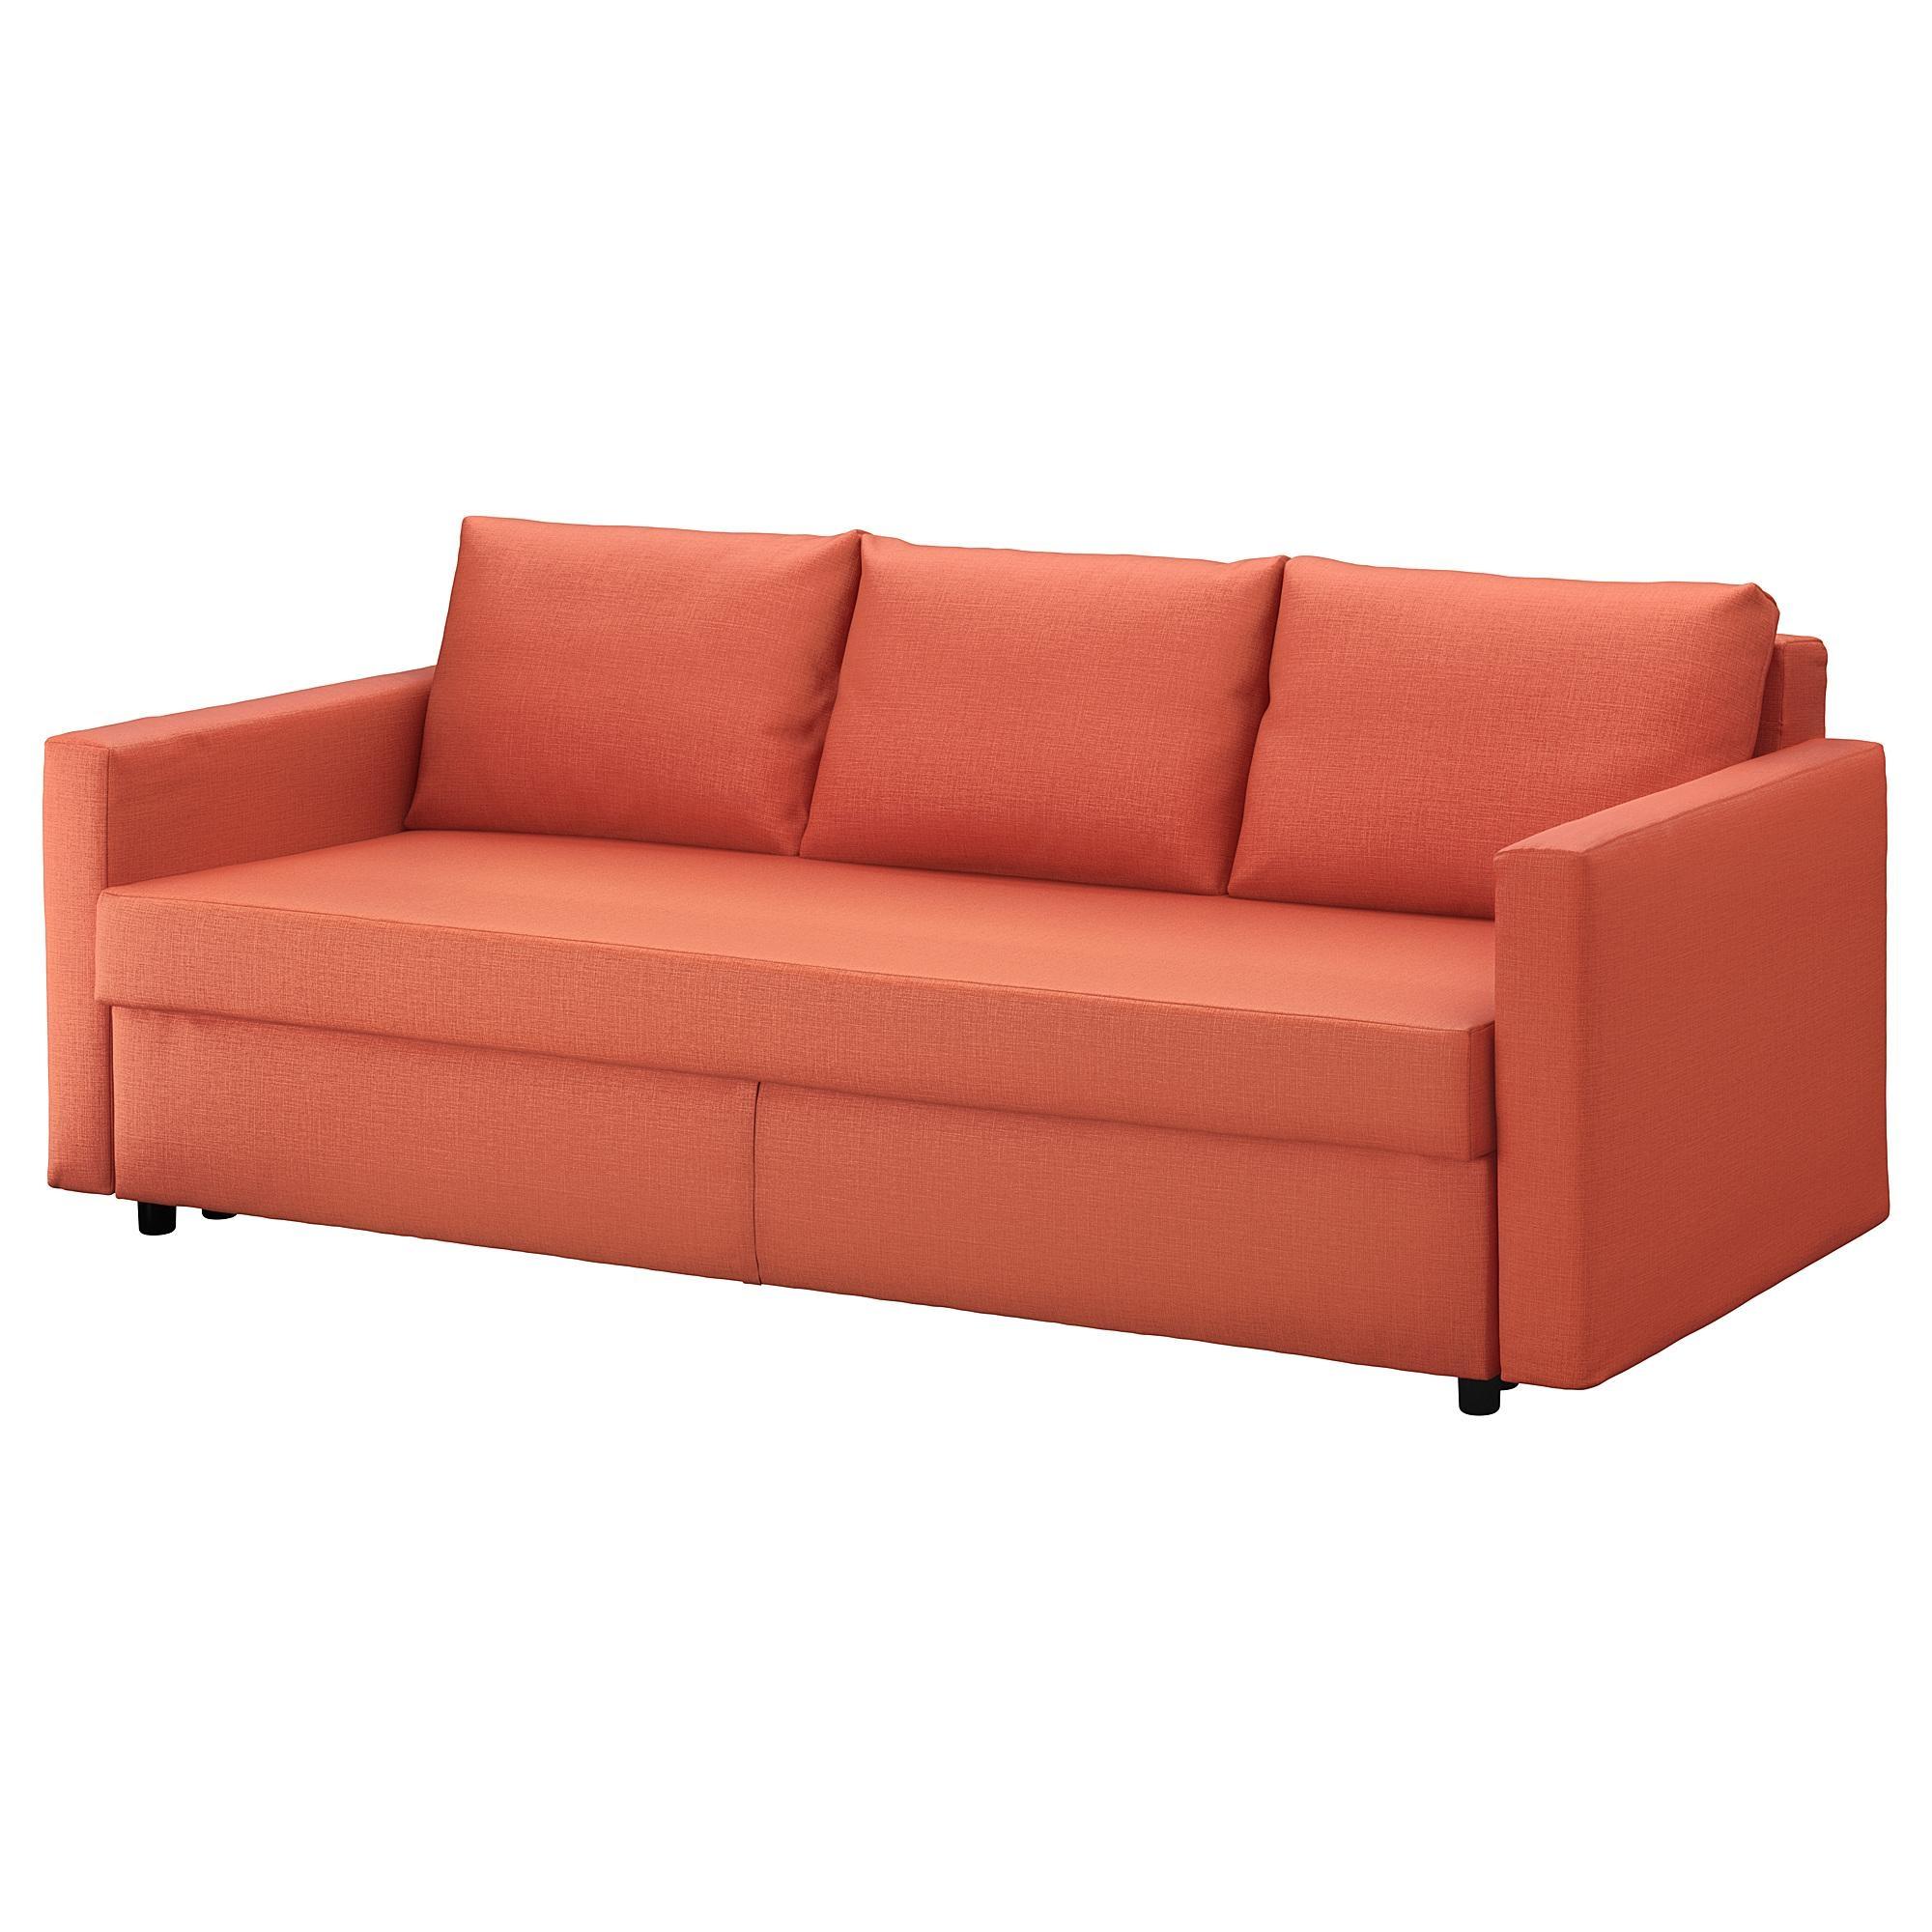 Friheten Sleeper Sofa – Skiftebo Dark Orange – Ikea In Red Sofa Beds Ikea (View 12 of 20)